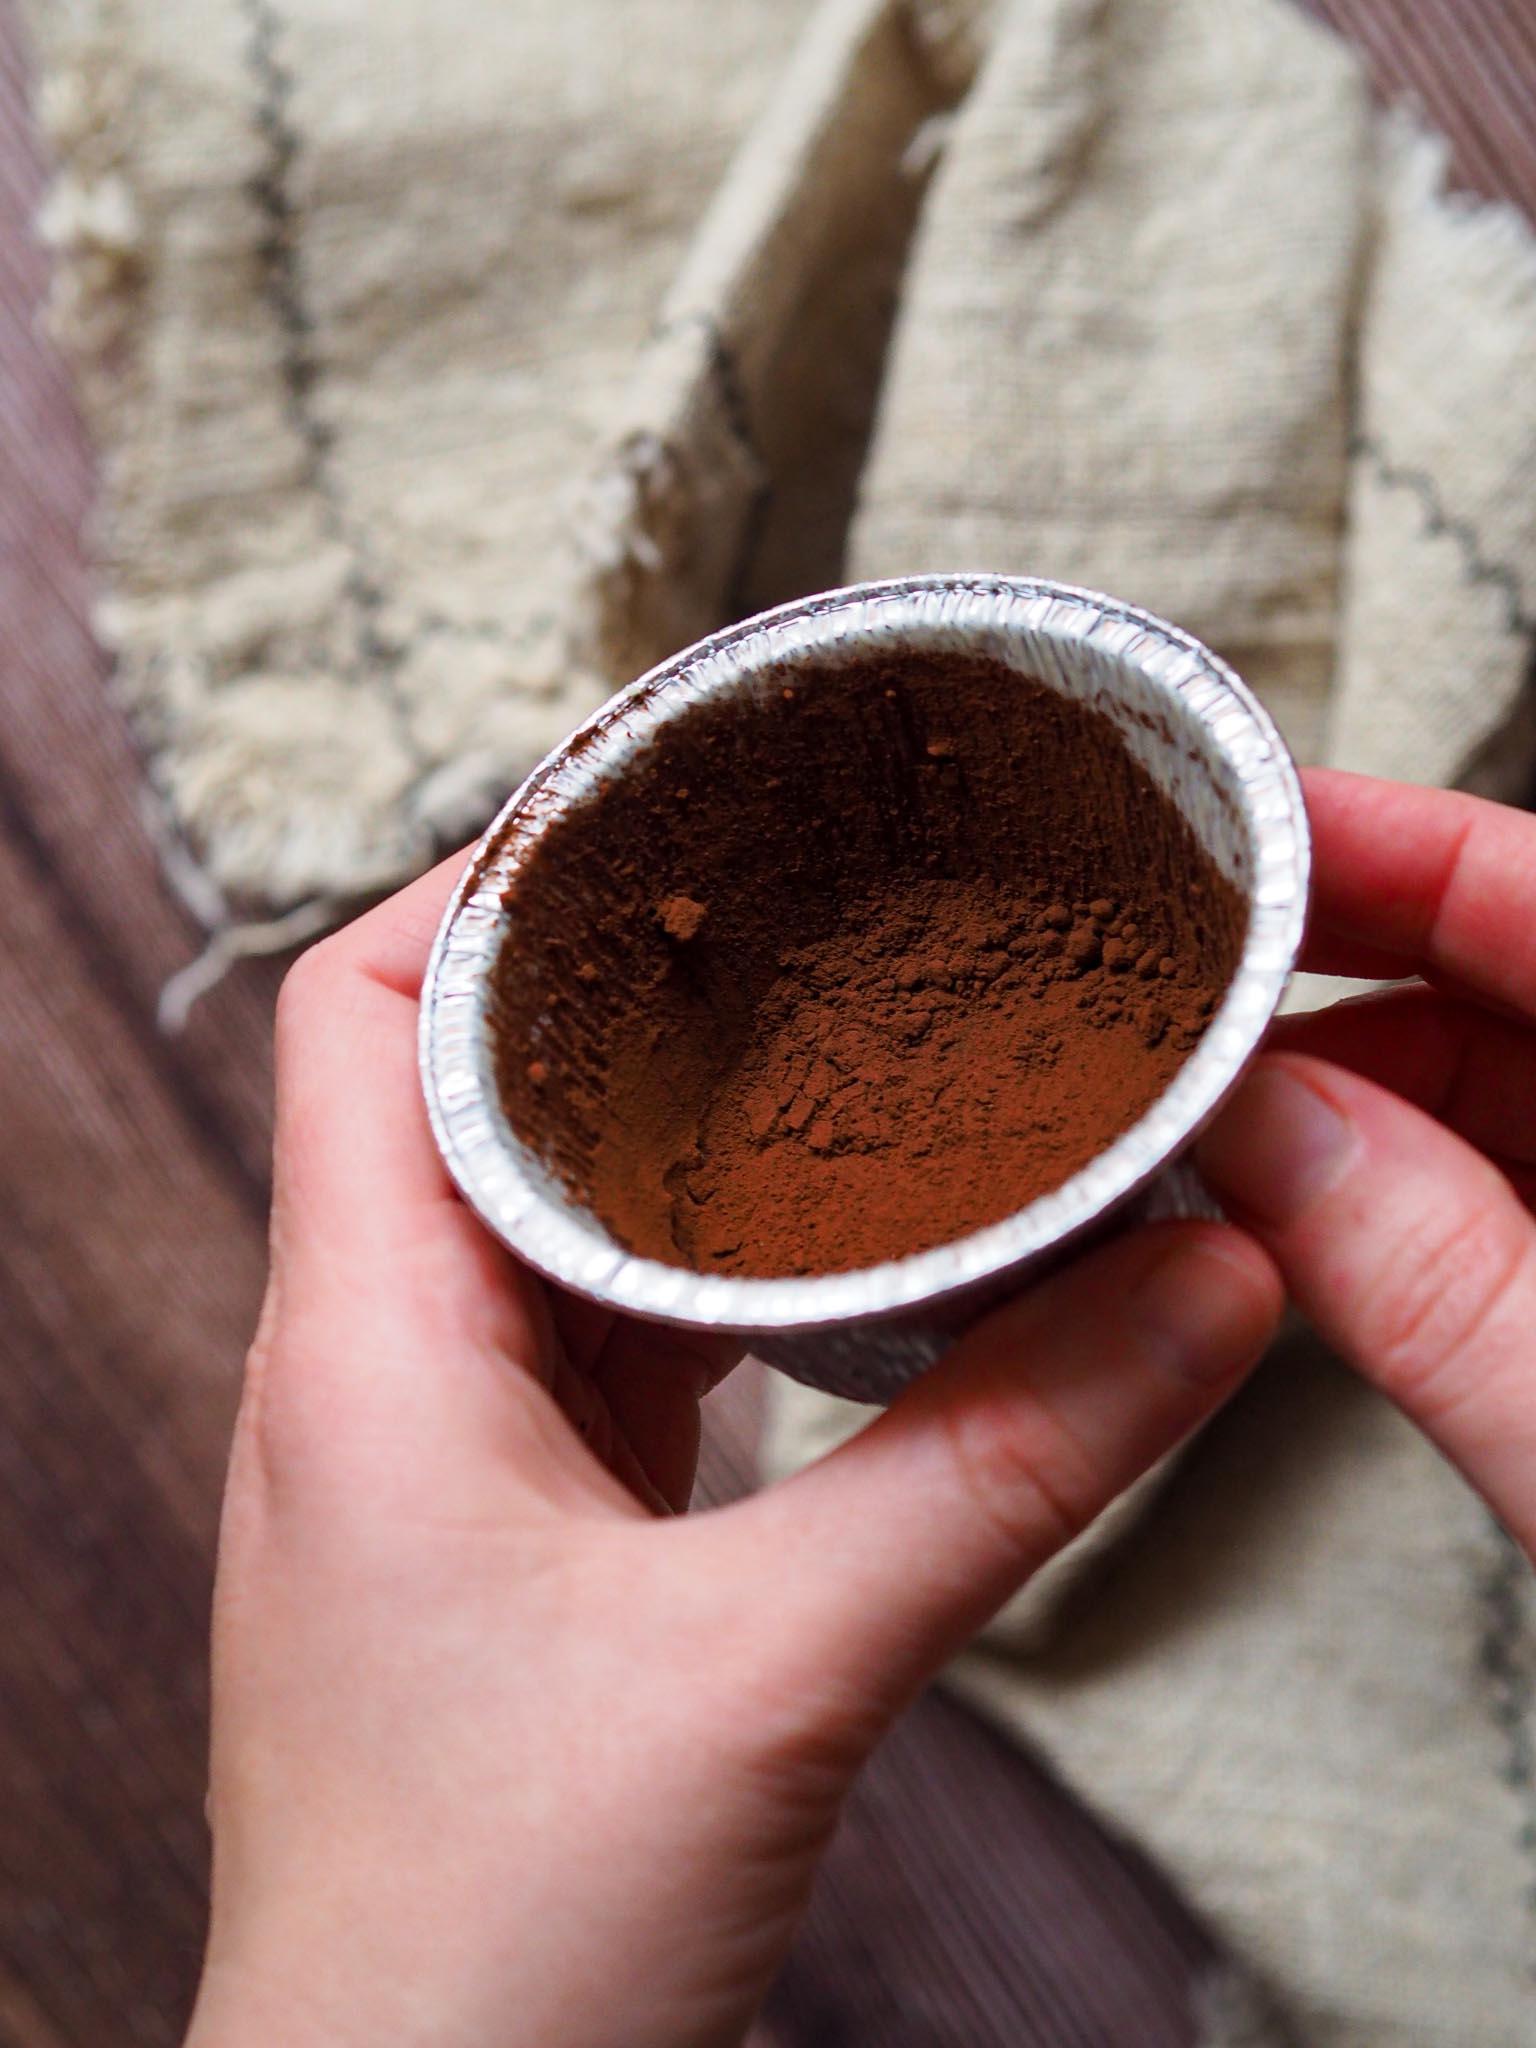 Chocolate brownie step 2